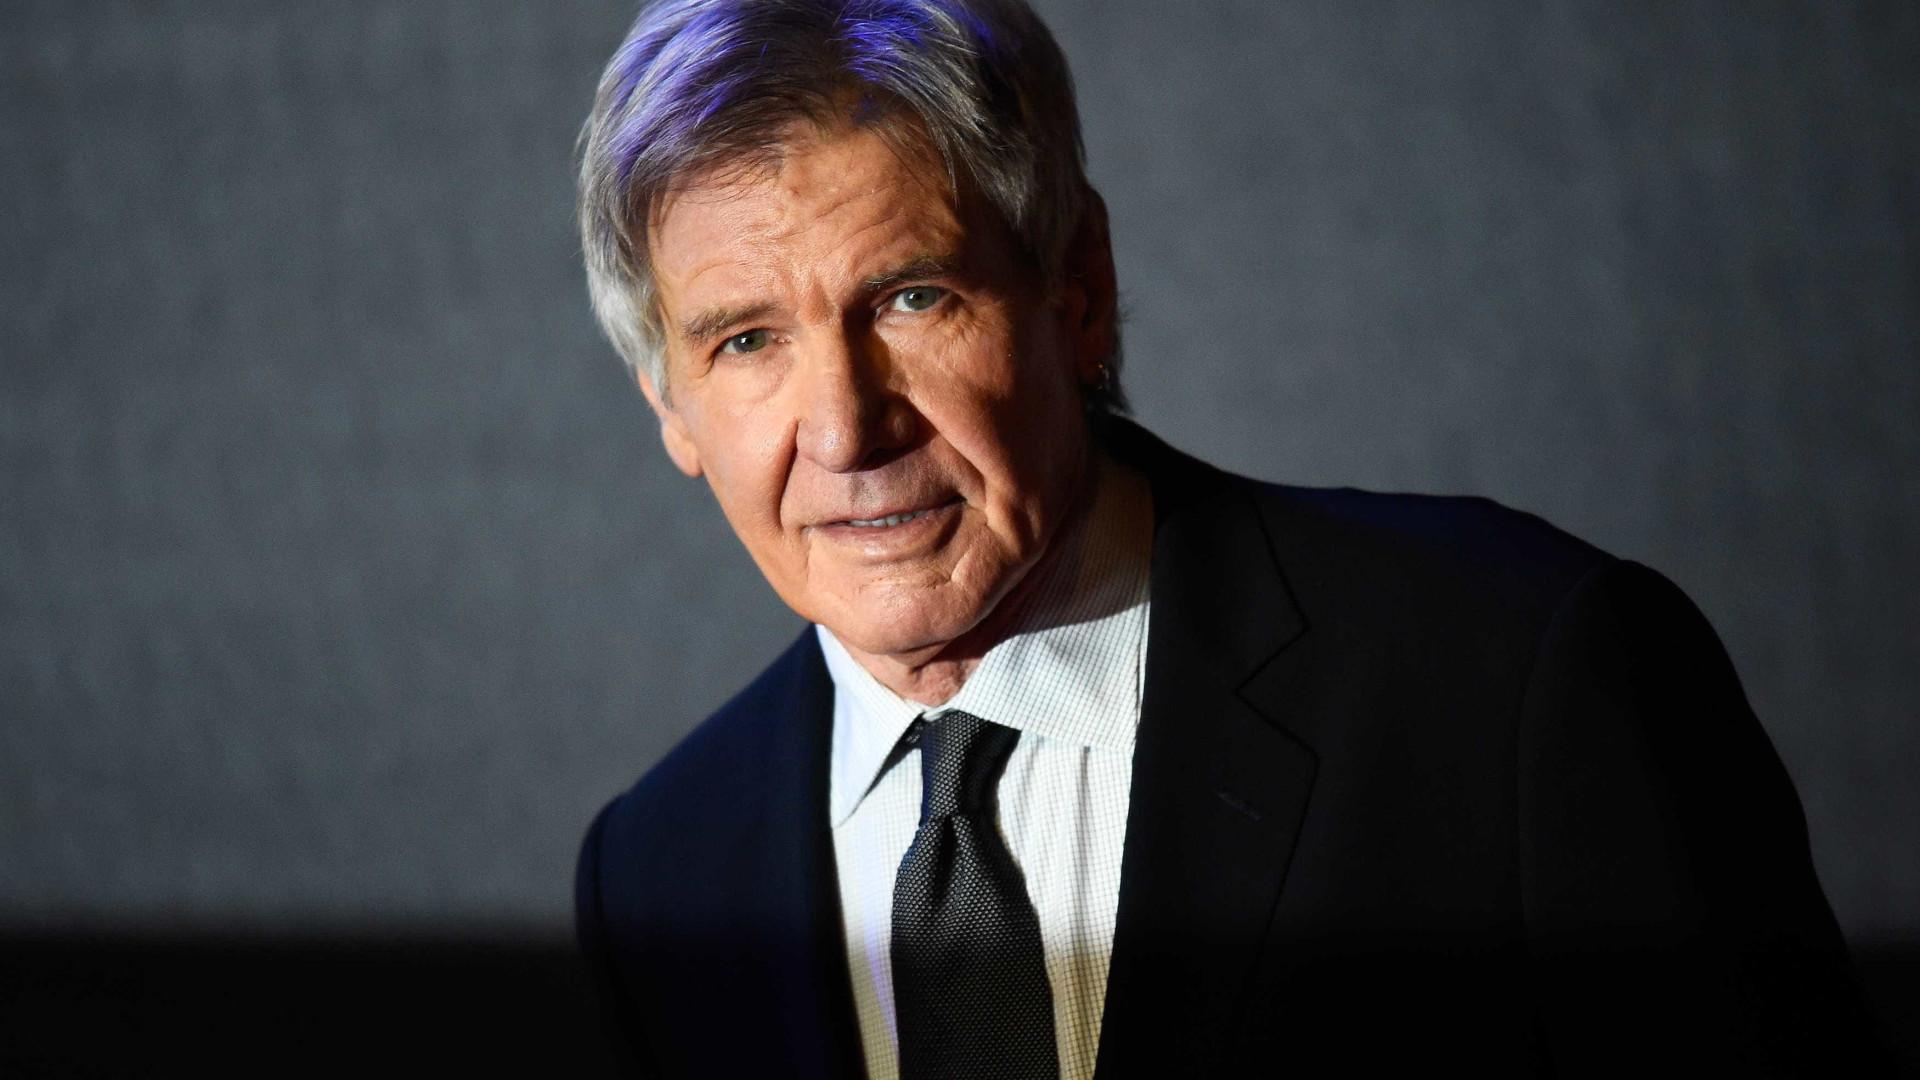 Harrison Ford presta socorro à mulher em acidente de carro